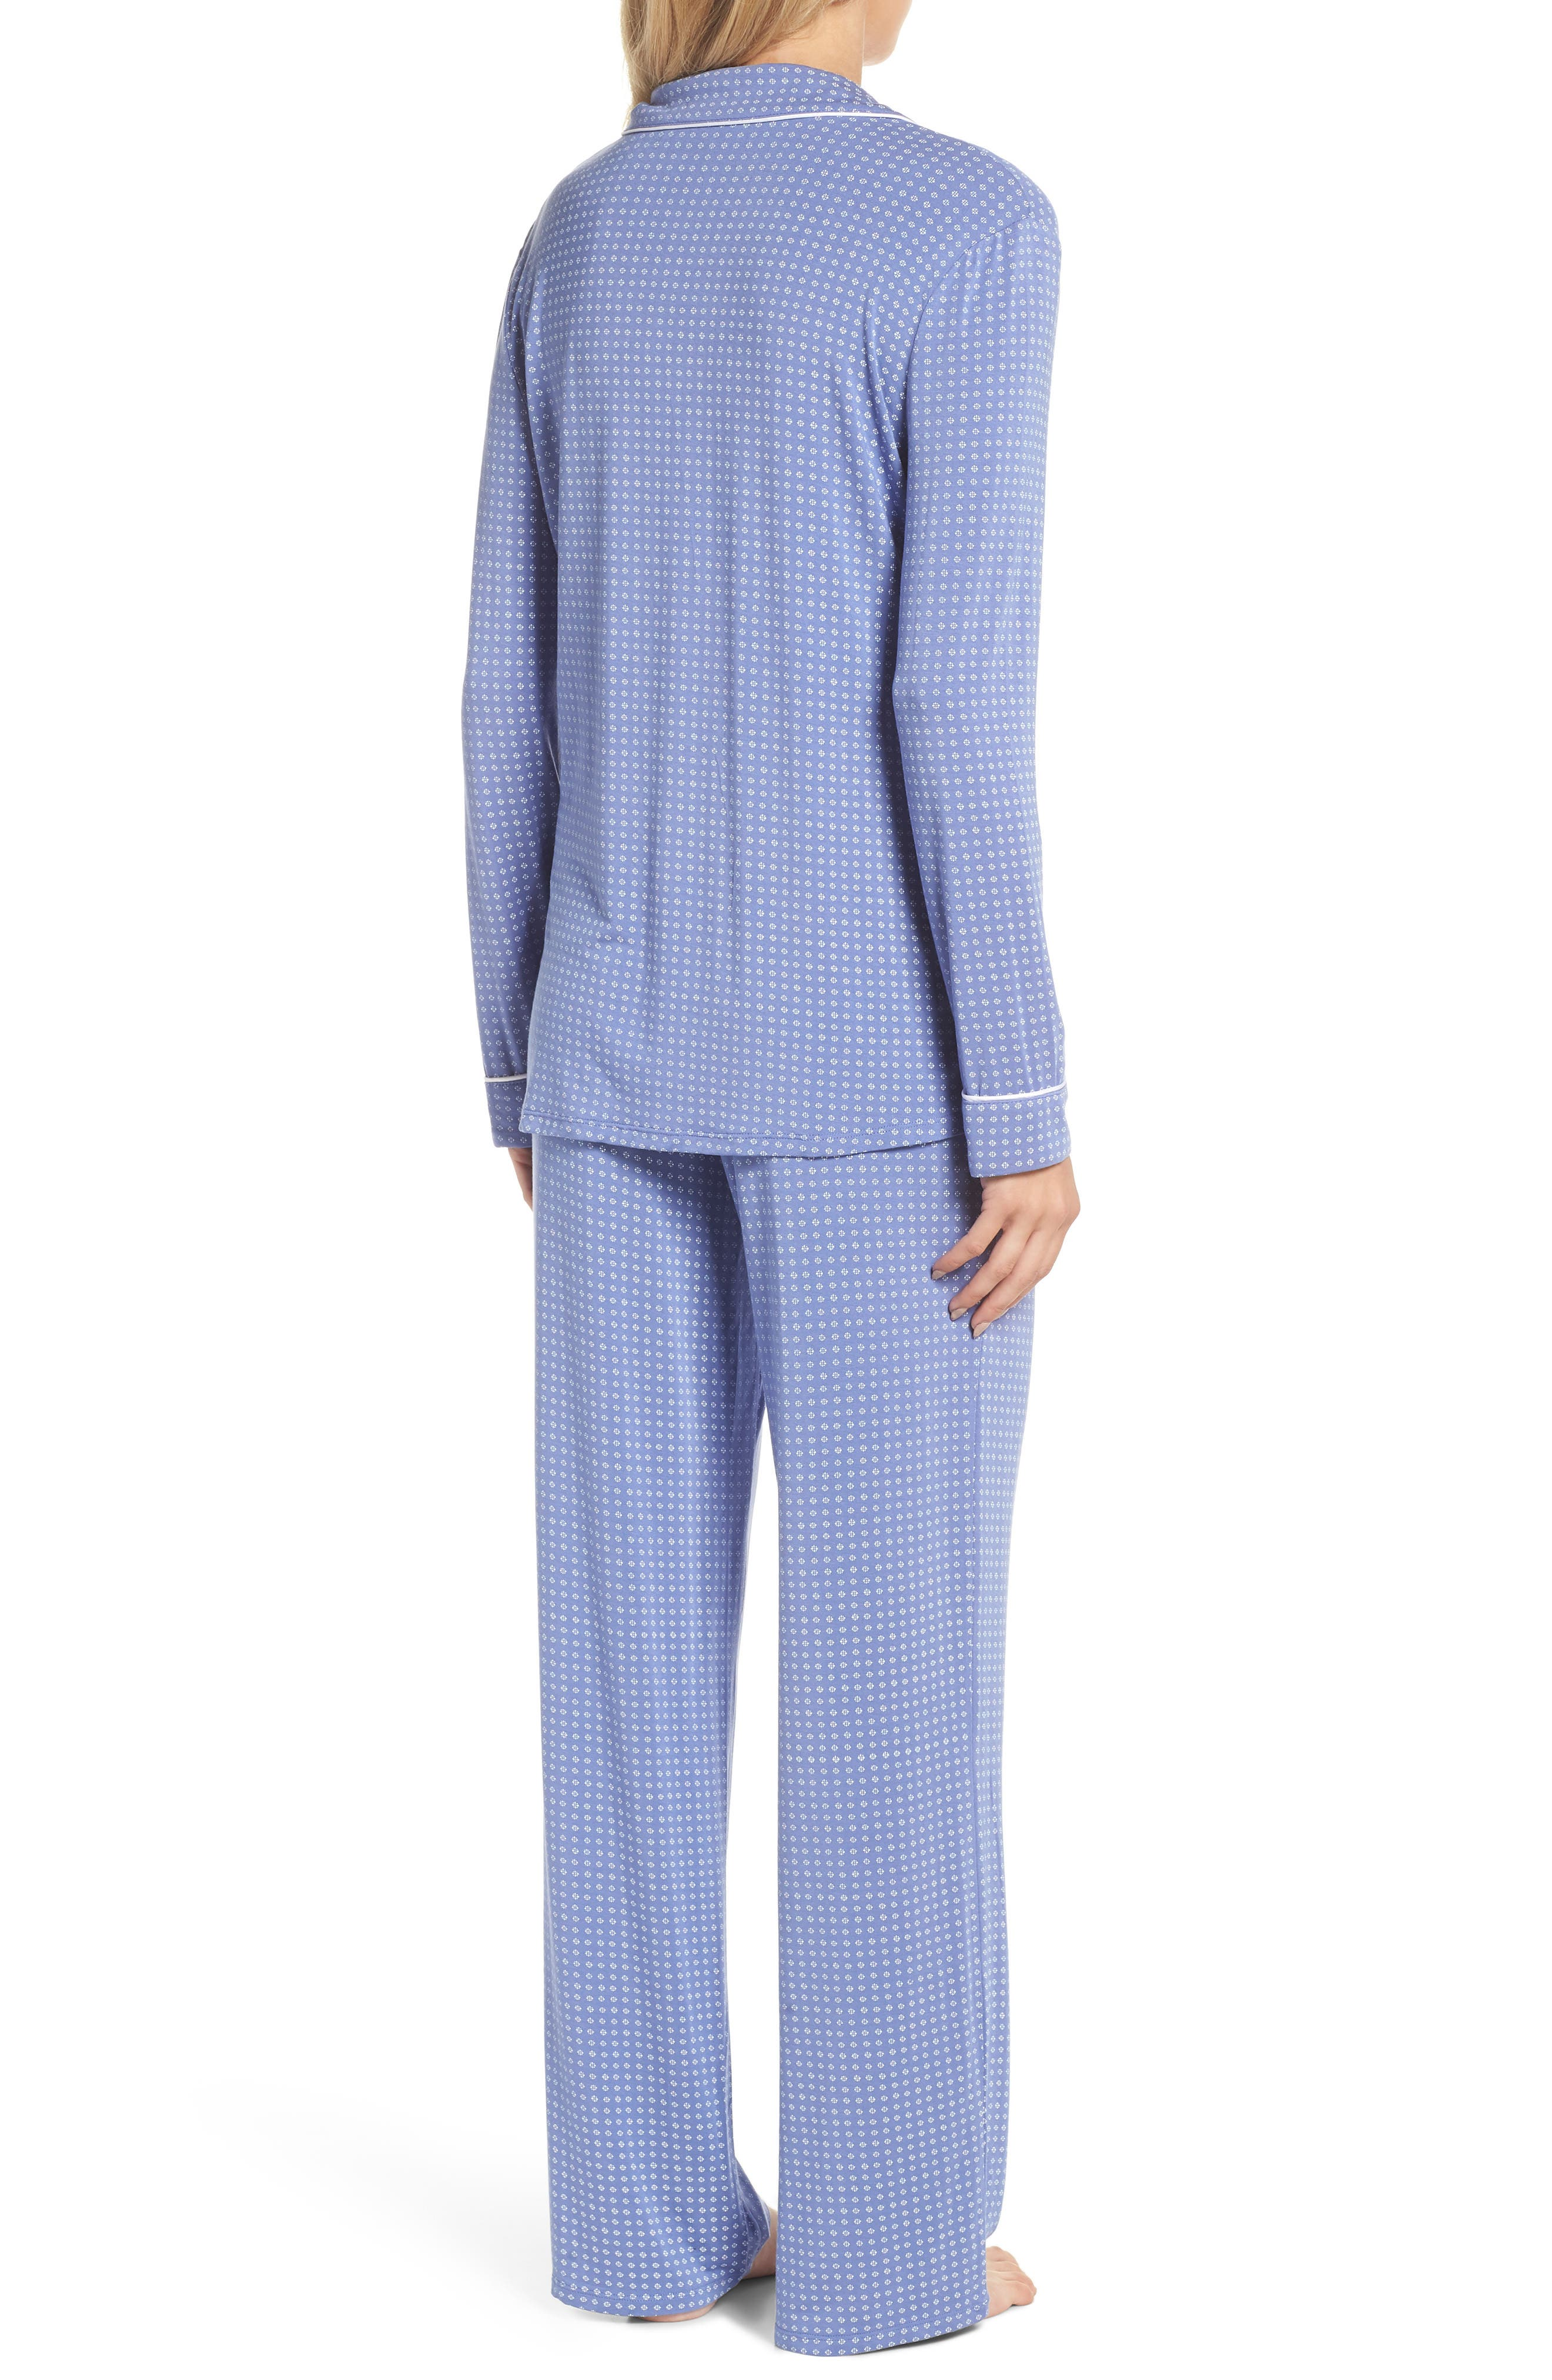 Moonlight Pajamas,                             Alternate thumbnail 2, color,                             Blue Denim Geo